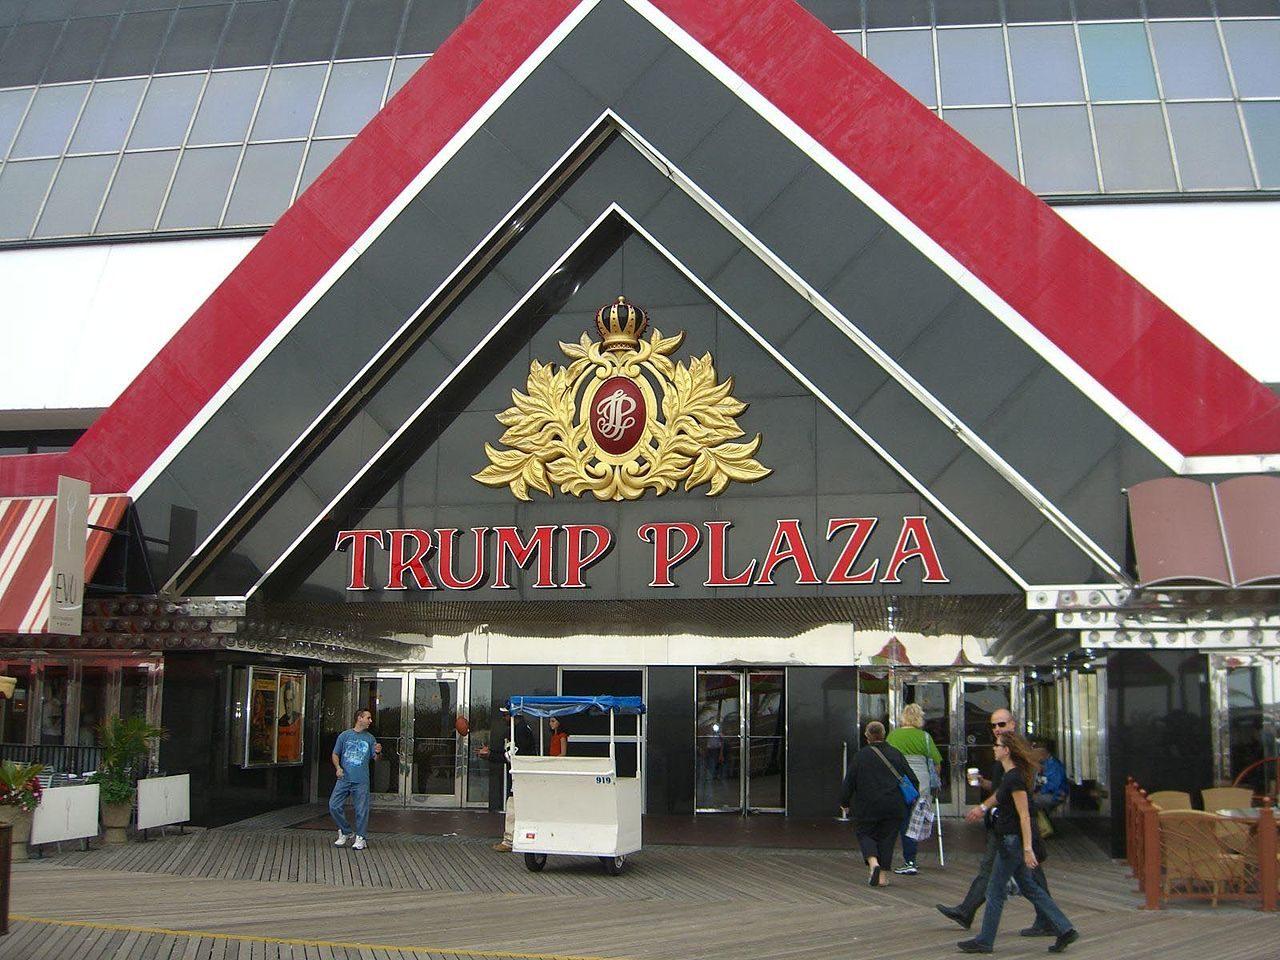 https://thesubmarine.it/wp-content/uploads/2017/03/1280px-TrumpPlaza-1280x960.jpg